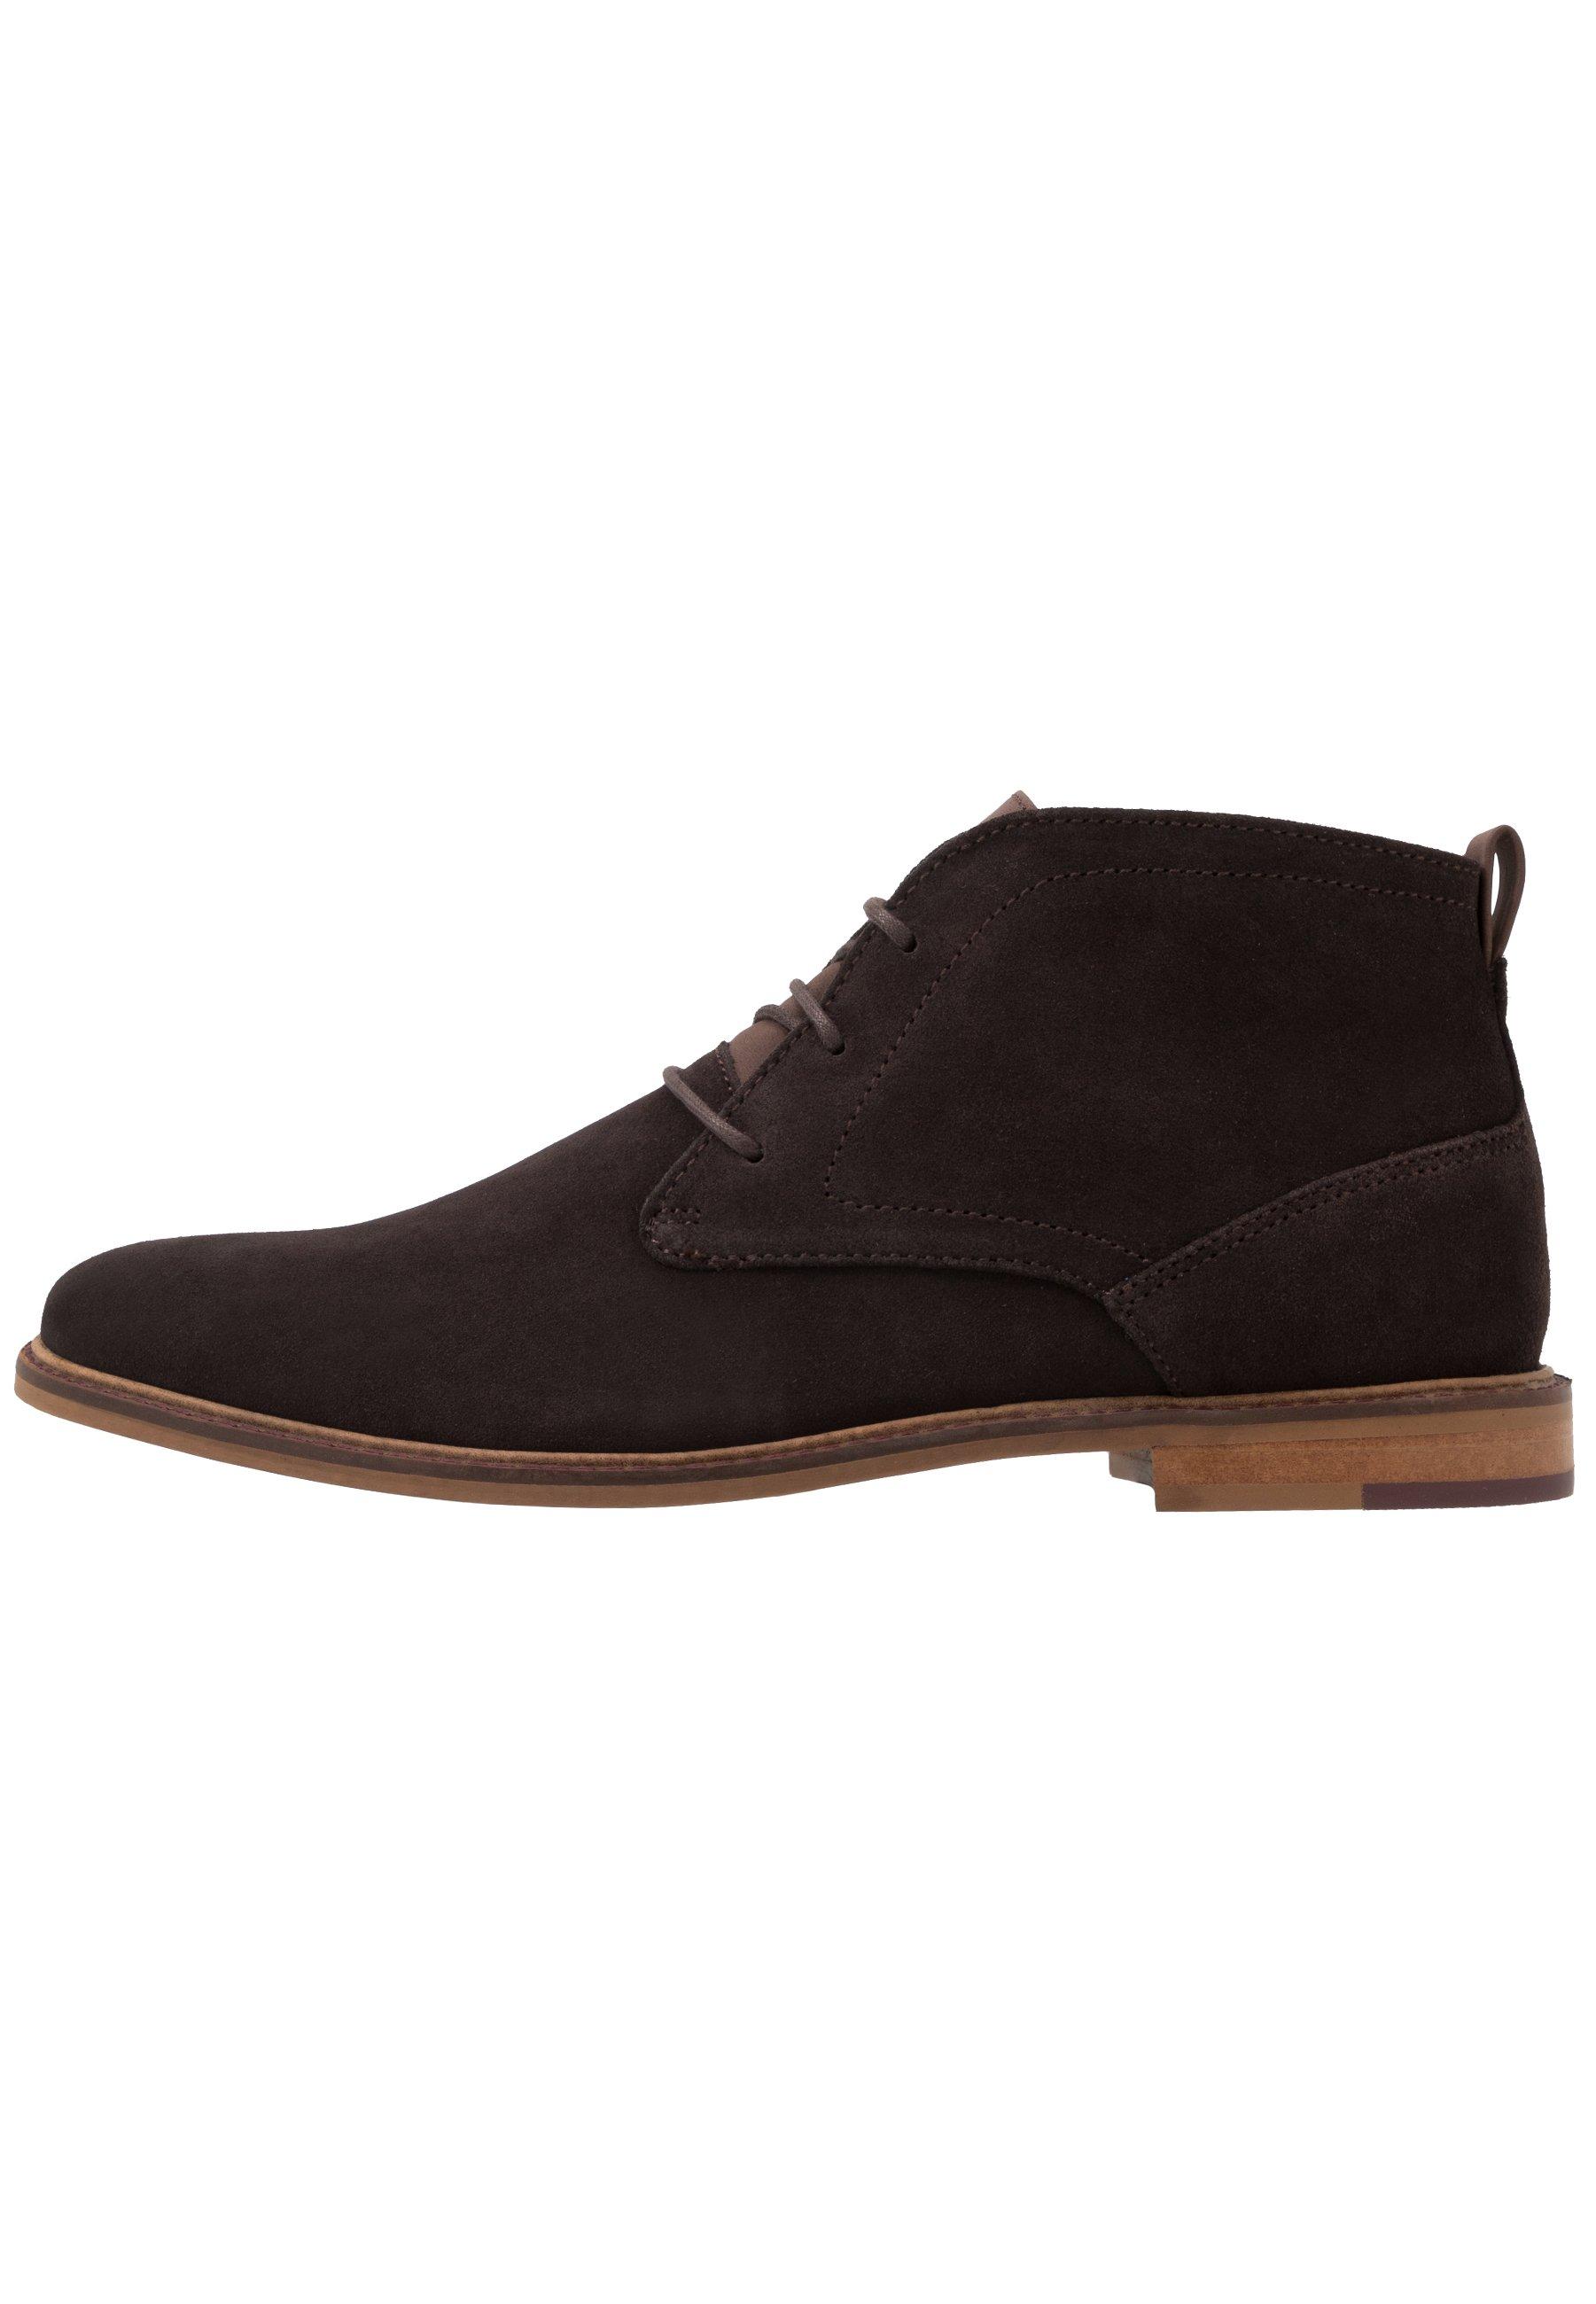 Burton Menswear London Schoenen online kopen   Gratis